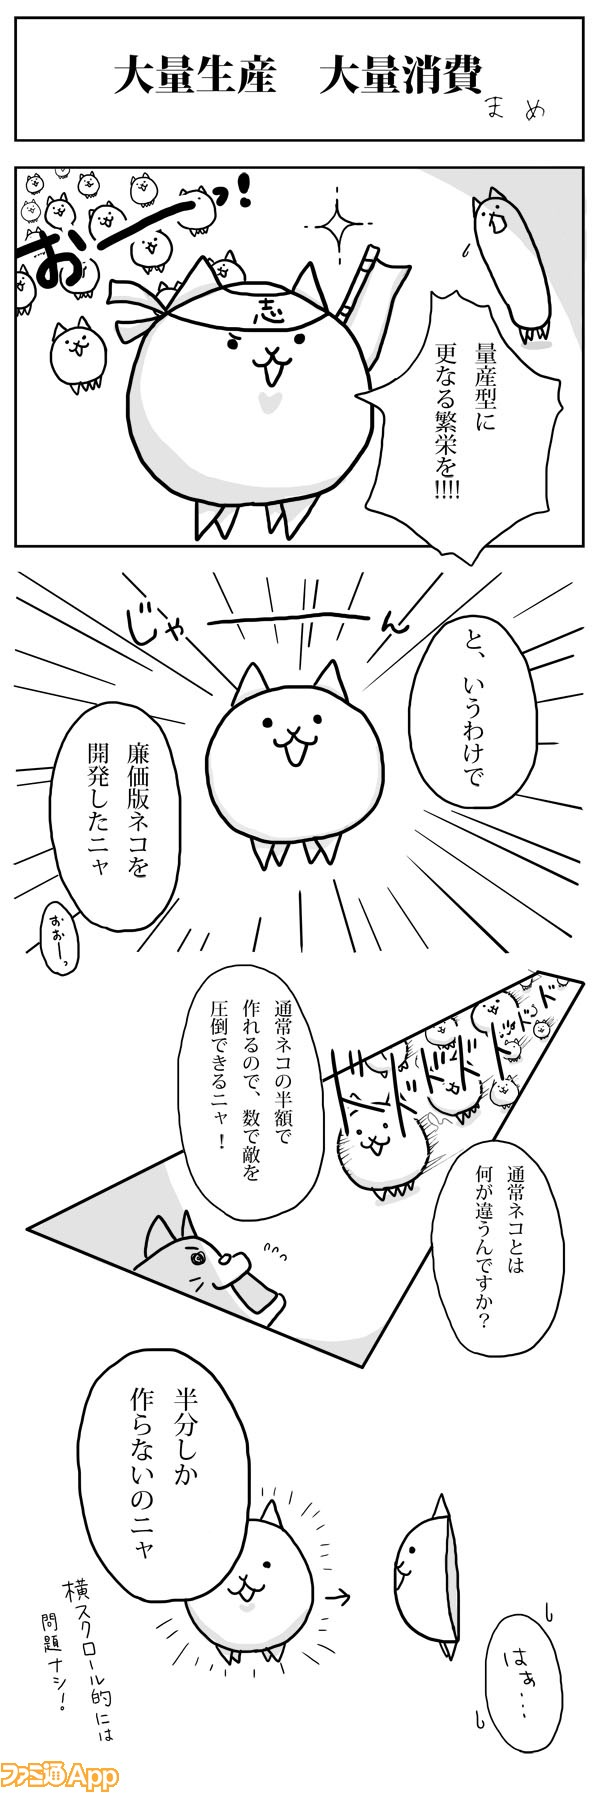 09mame_002